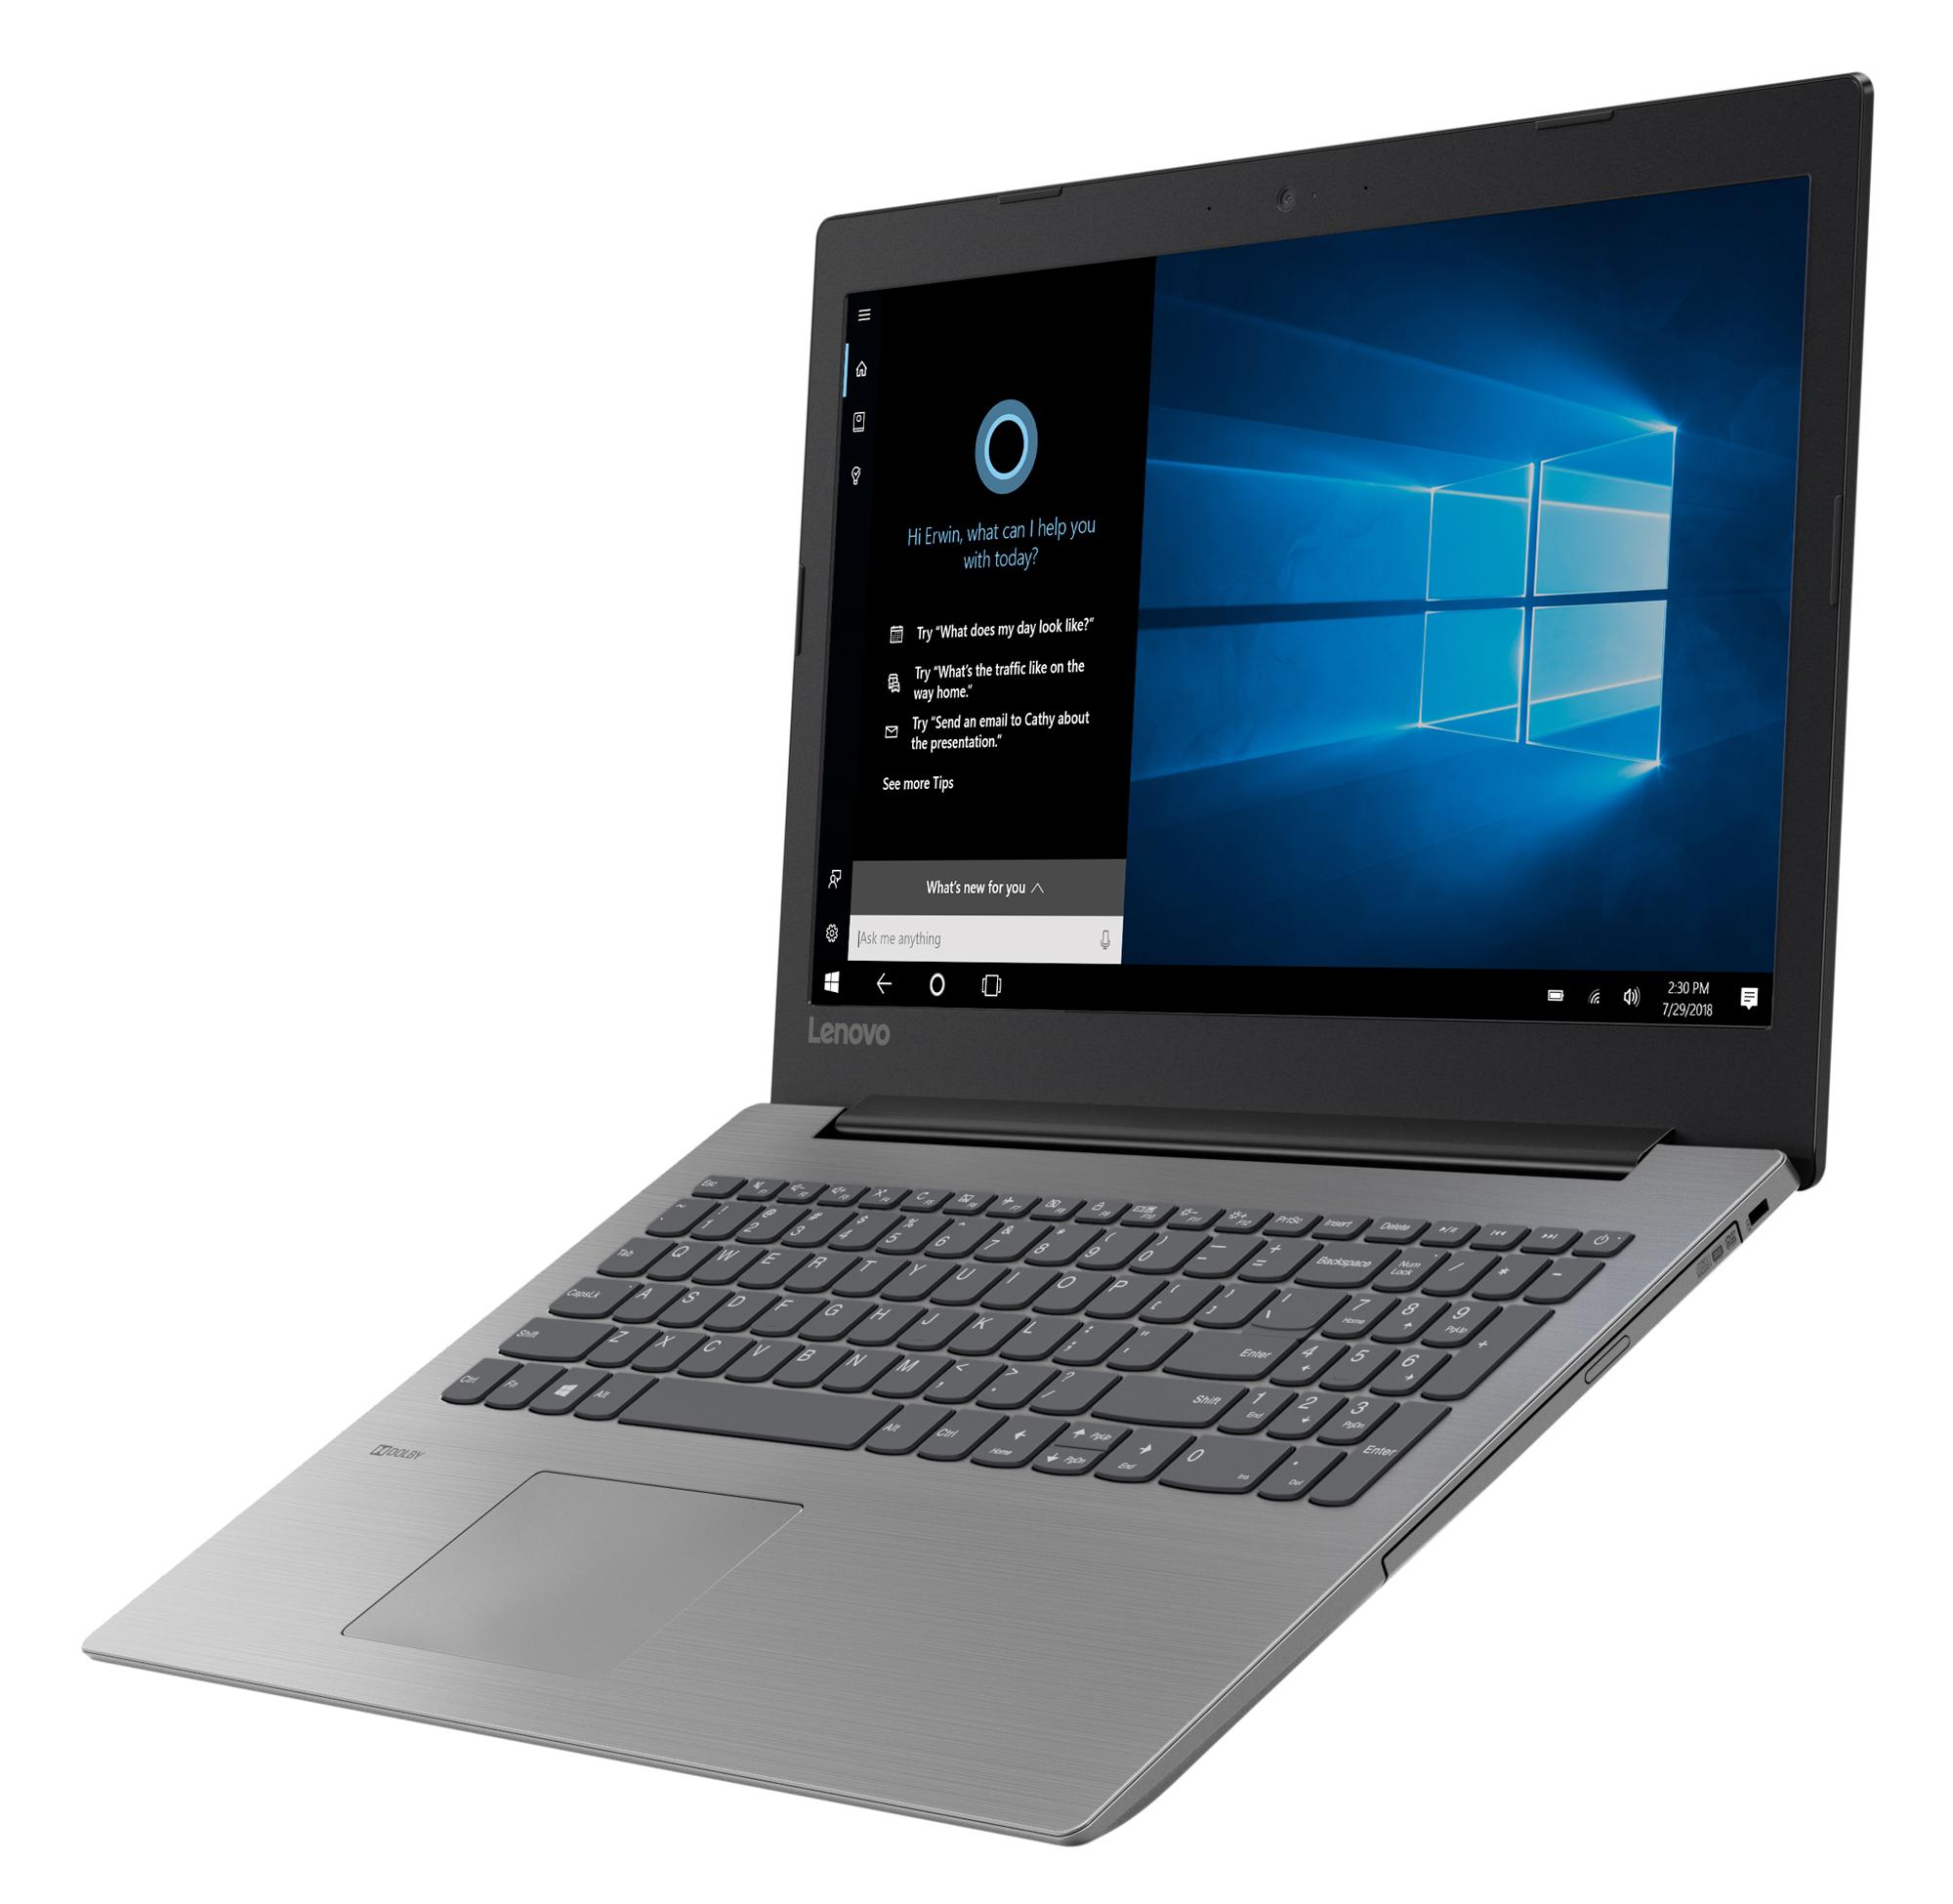 Фото  Ноутбук Lenovo ideapad 330-15 Onyx Black (81DC005URA)